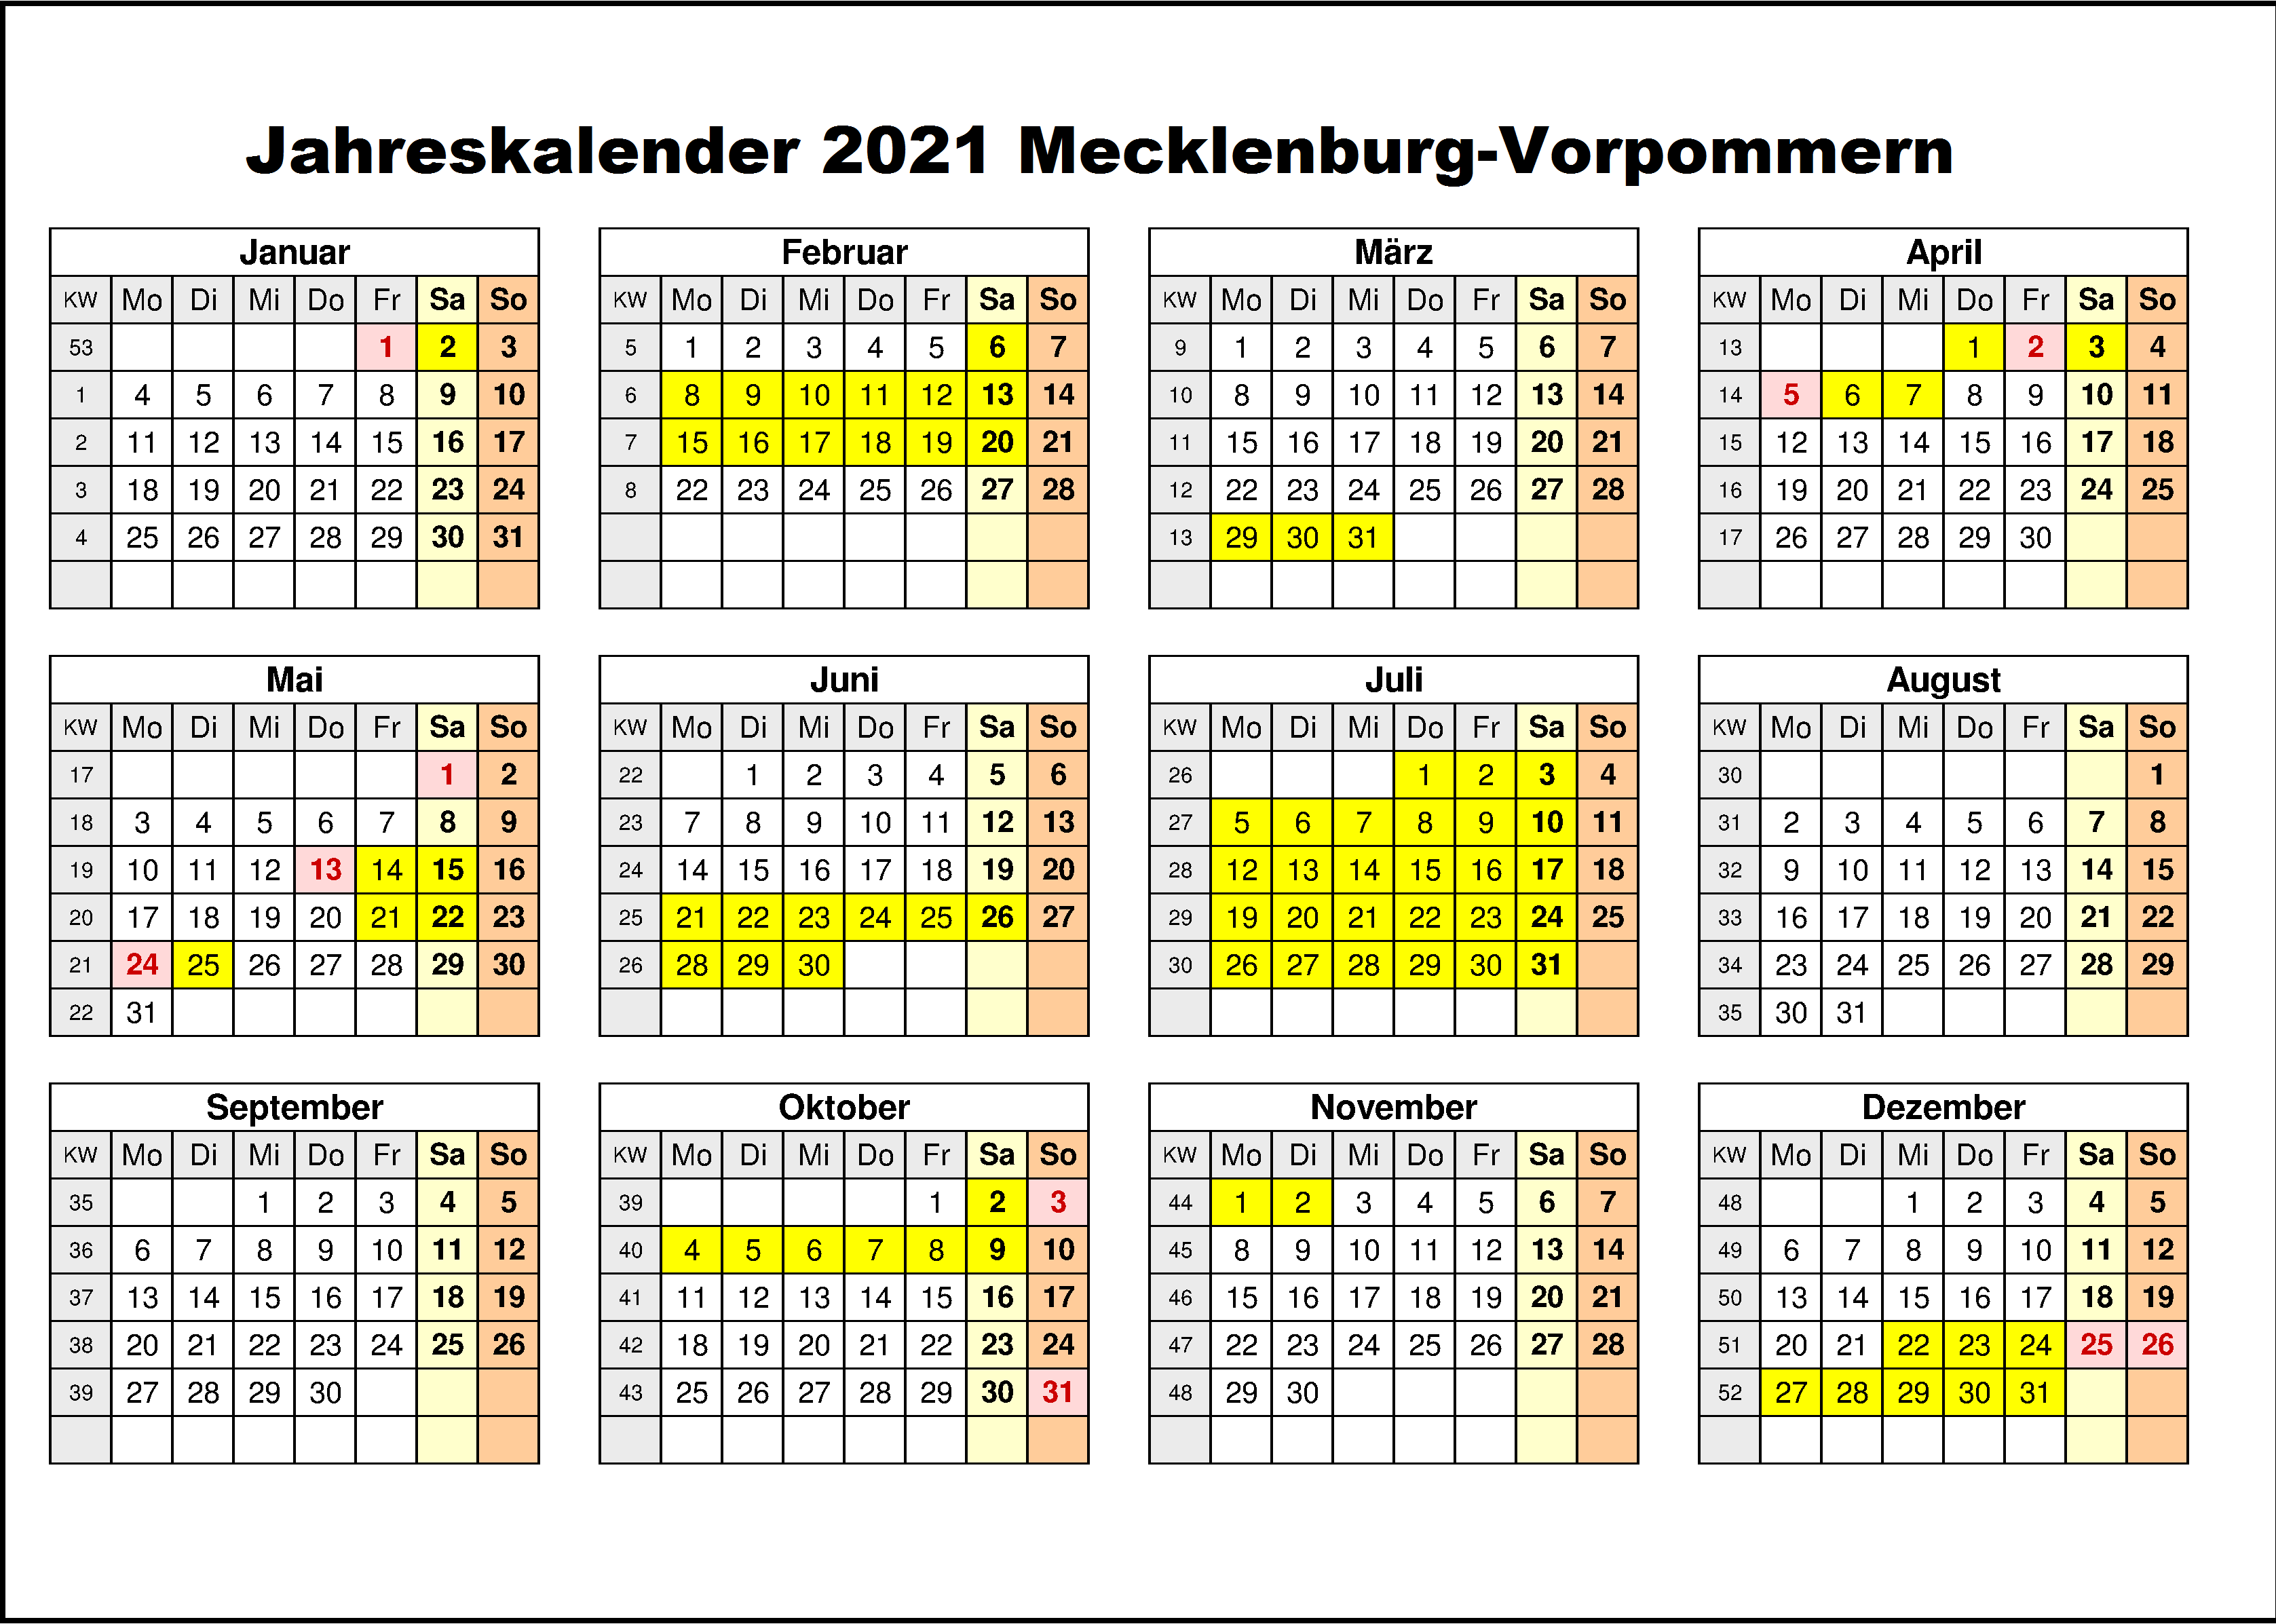 Jahreskalender 2021 Mecklenburg-Vorpommern PDF